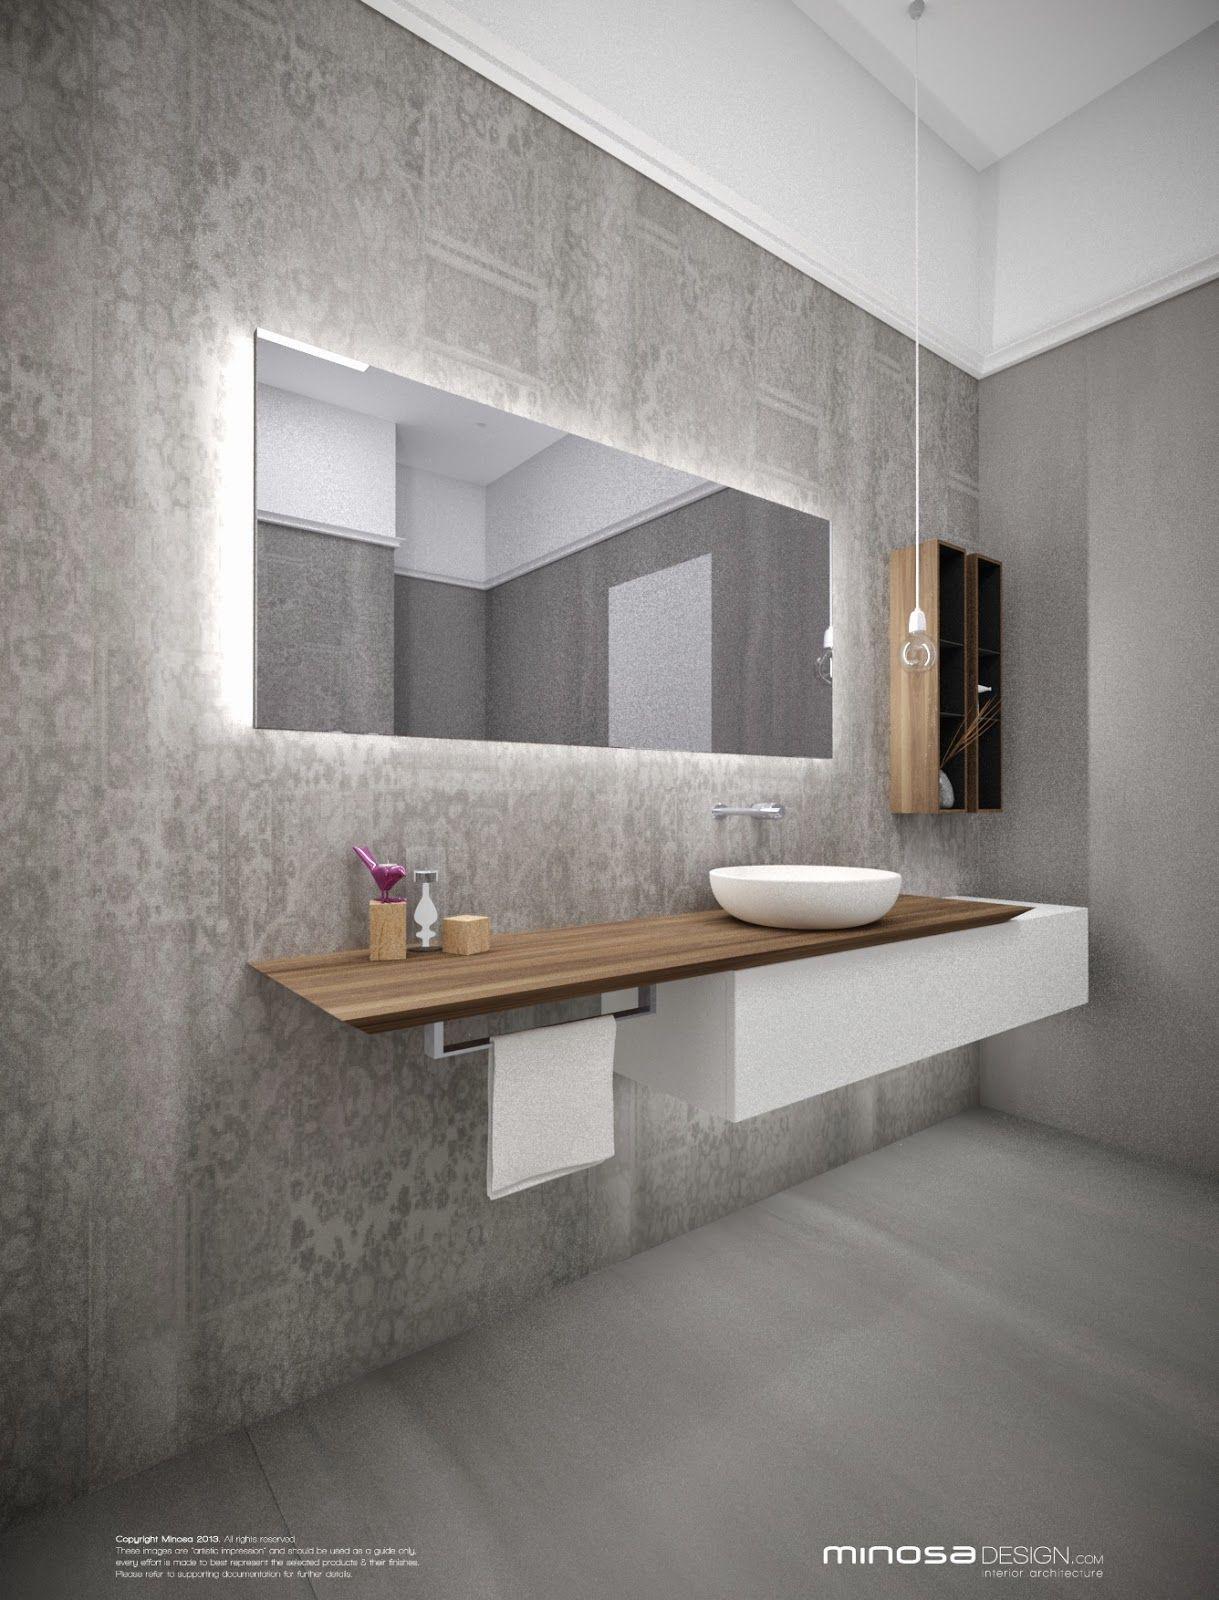 light grey bathroom floor wall bath path pinterest badezimmer hellgraue badezimmer and. Black Bedroom Furniture Sets. Home Design Ideas